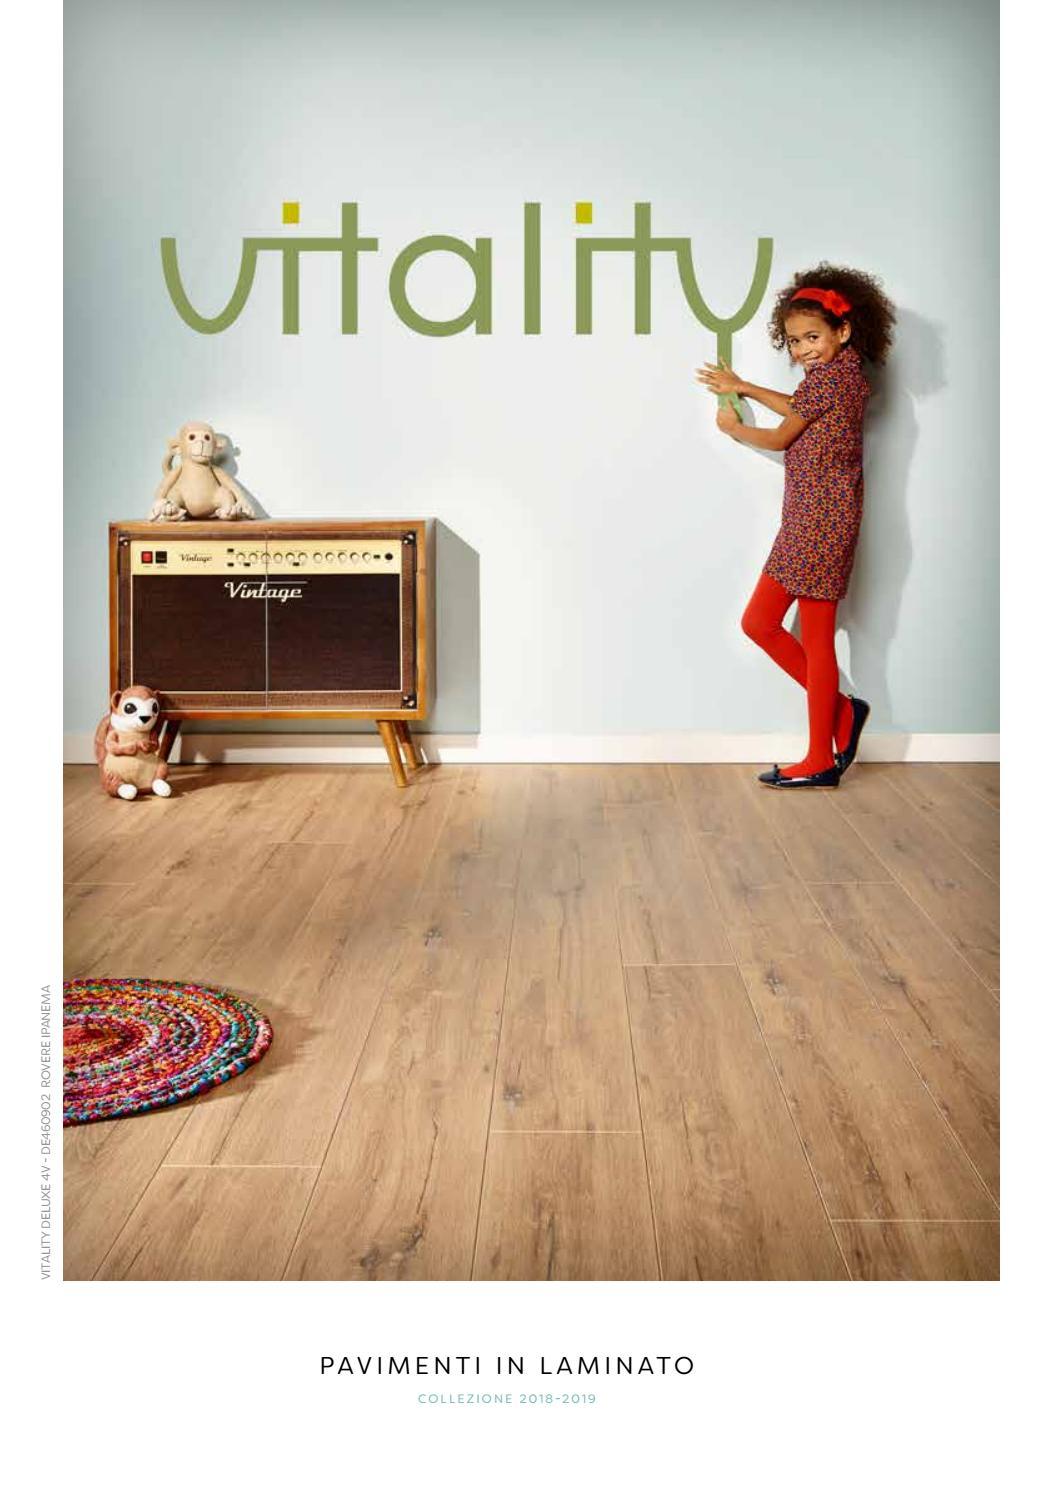 Pavimento Pvc Flottante Opinioni unilin - vitality-woodline myo-nord by unico - issuu